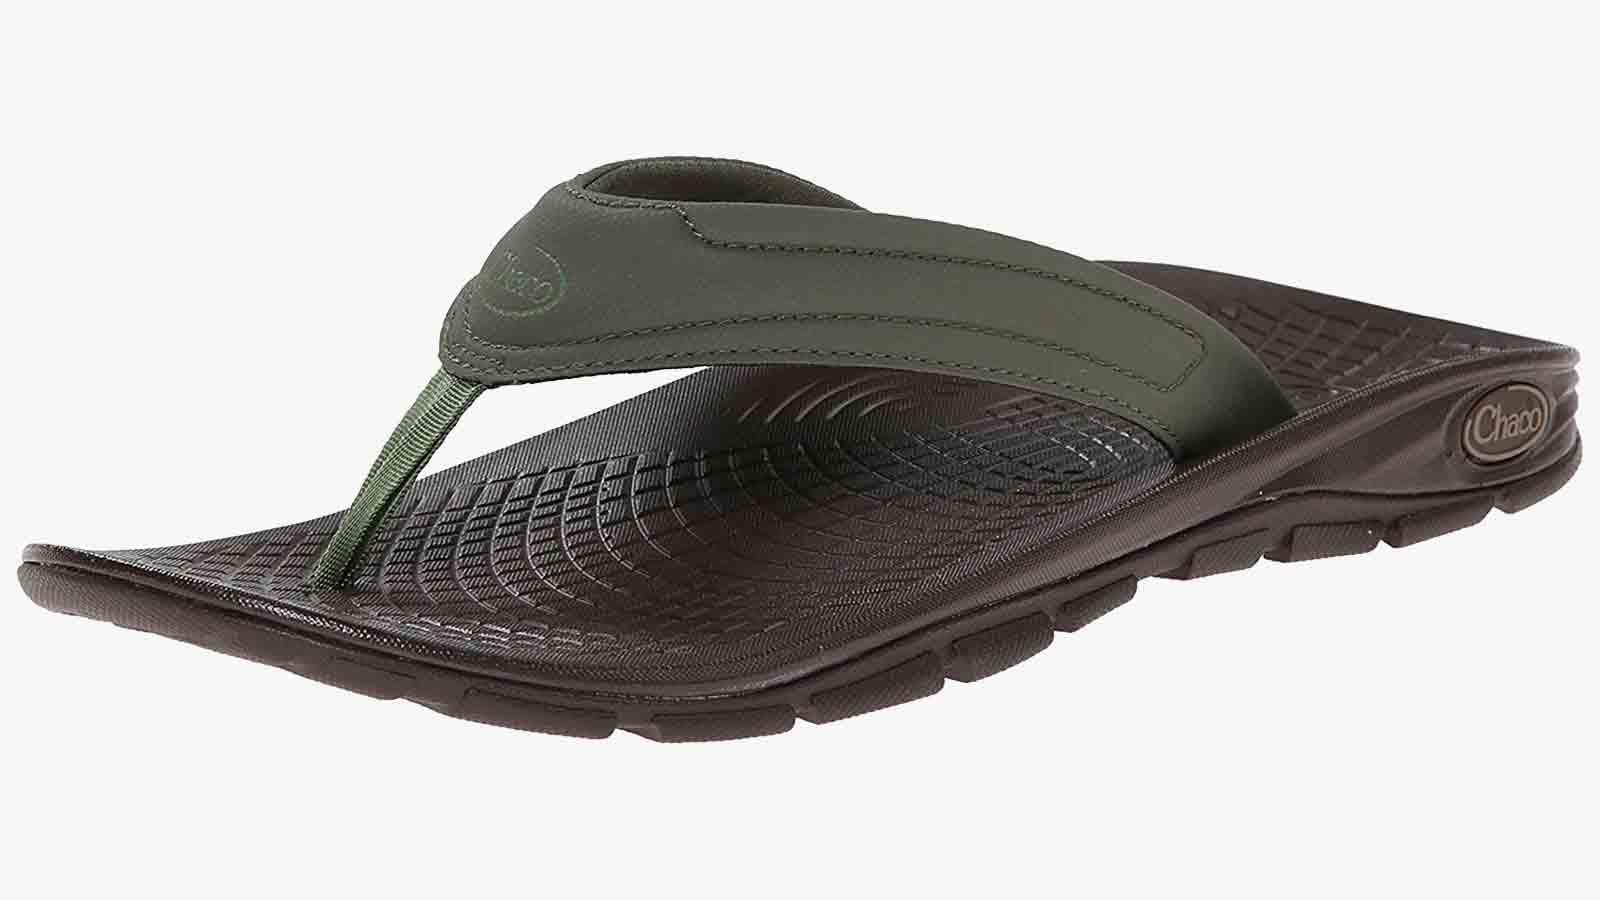 73b93787e21c 20 of the Best Men s Flip-Flops